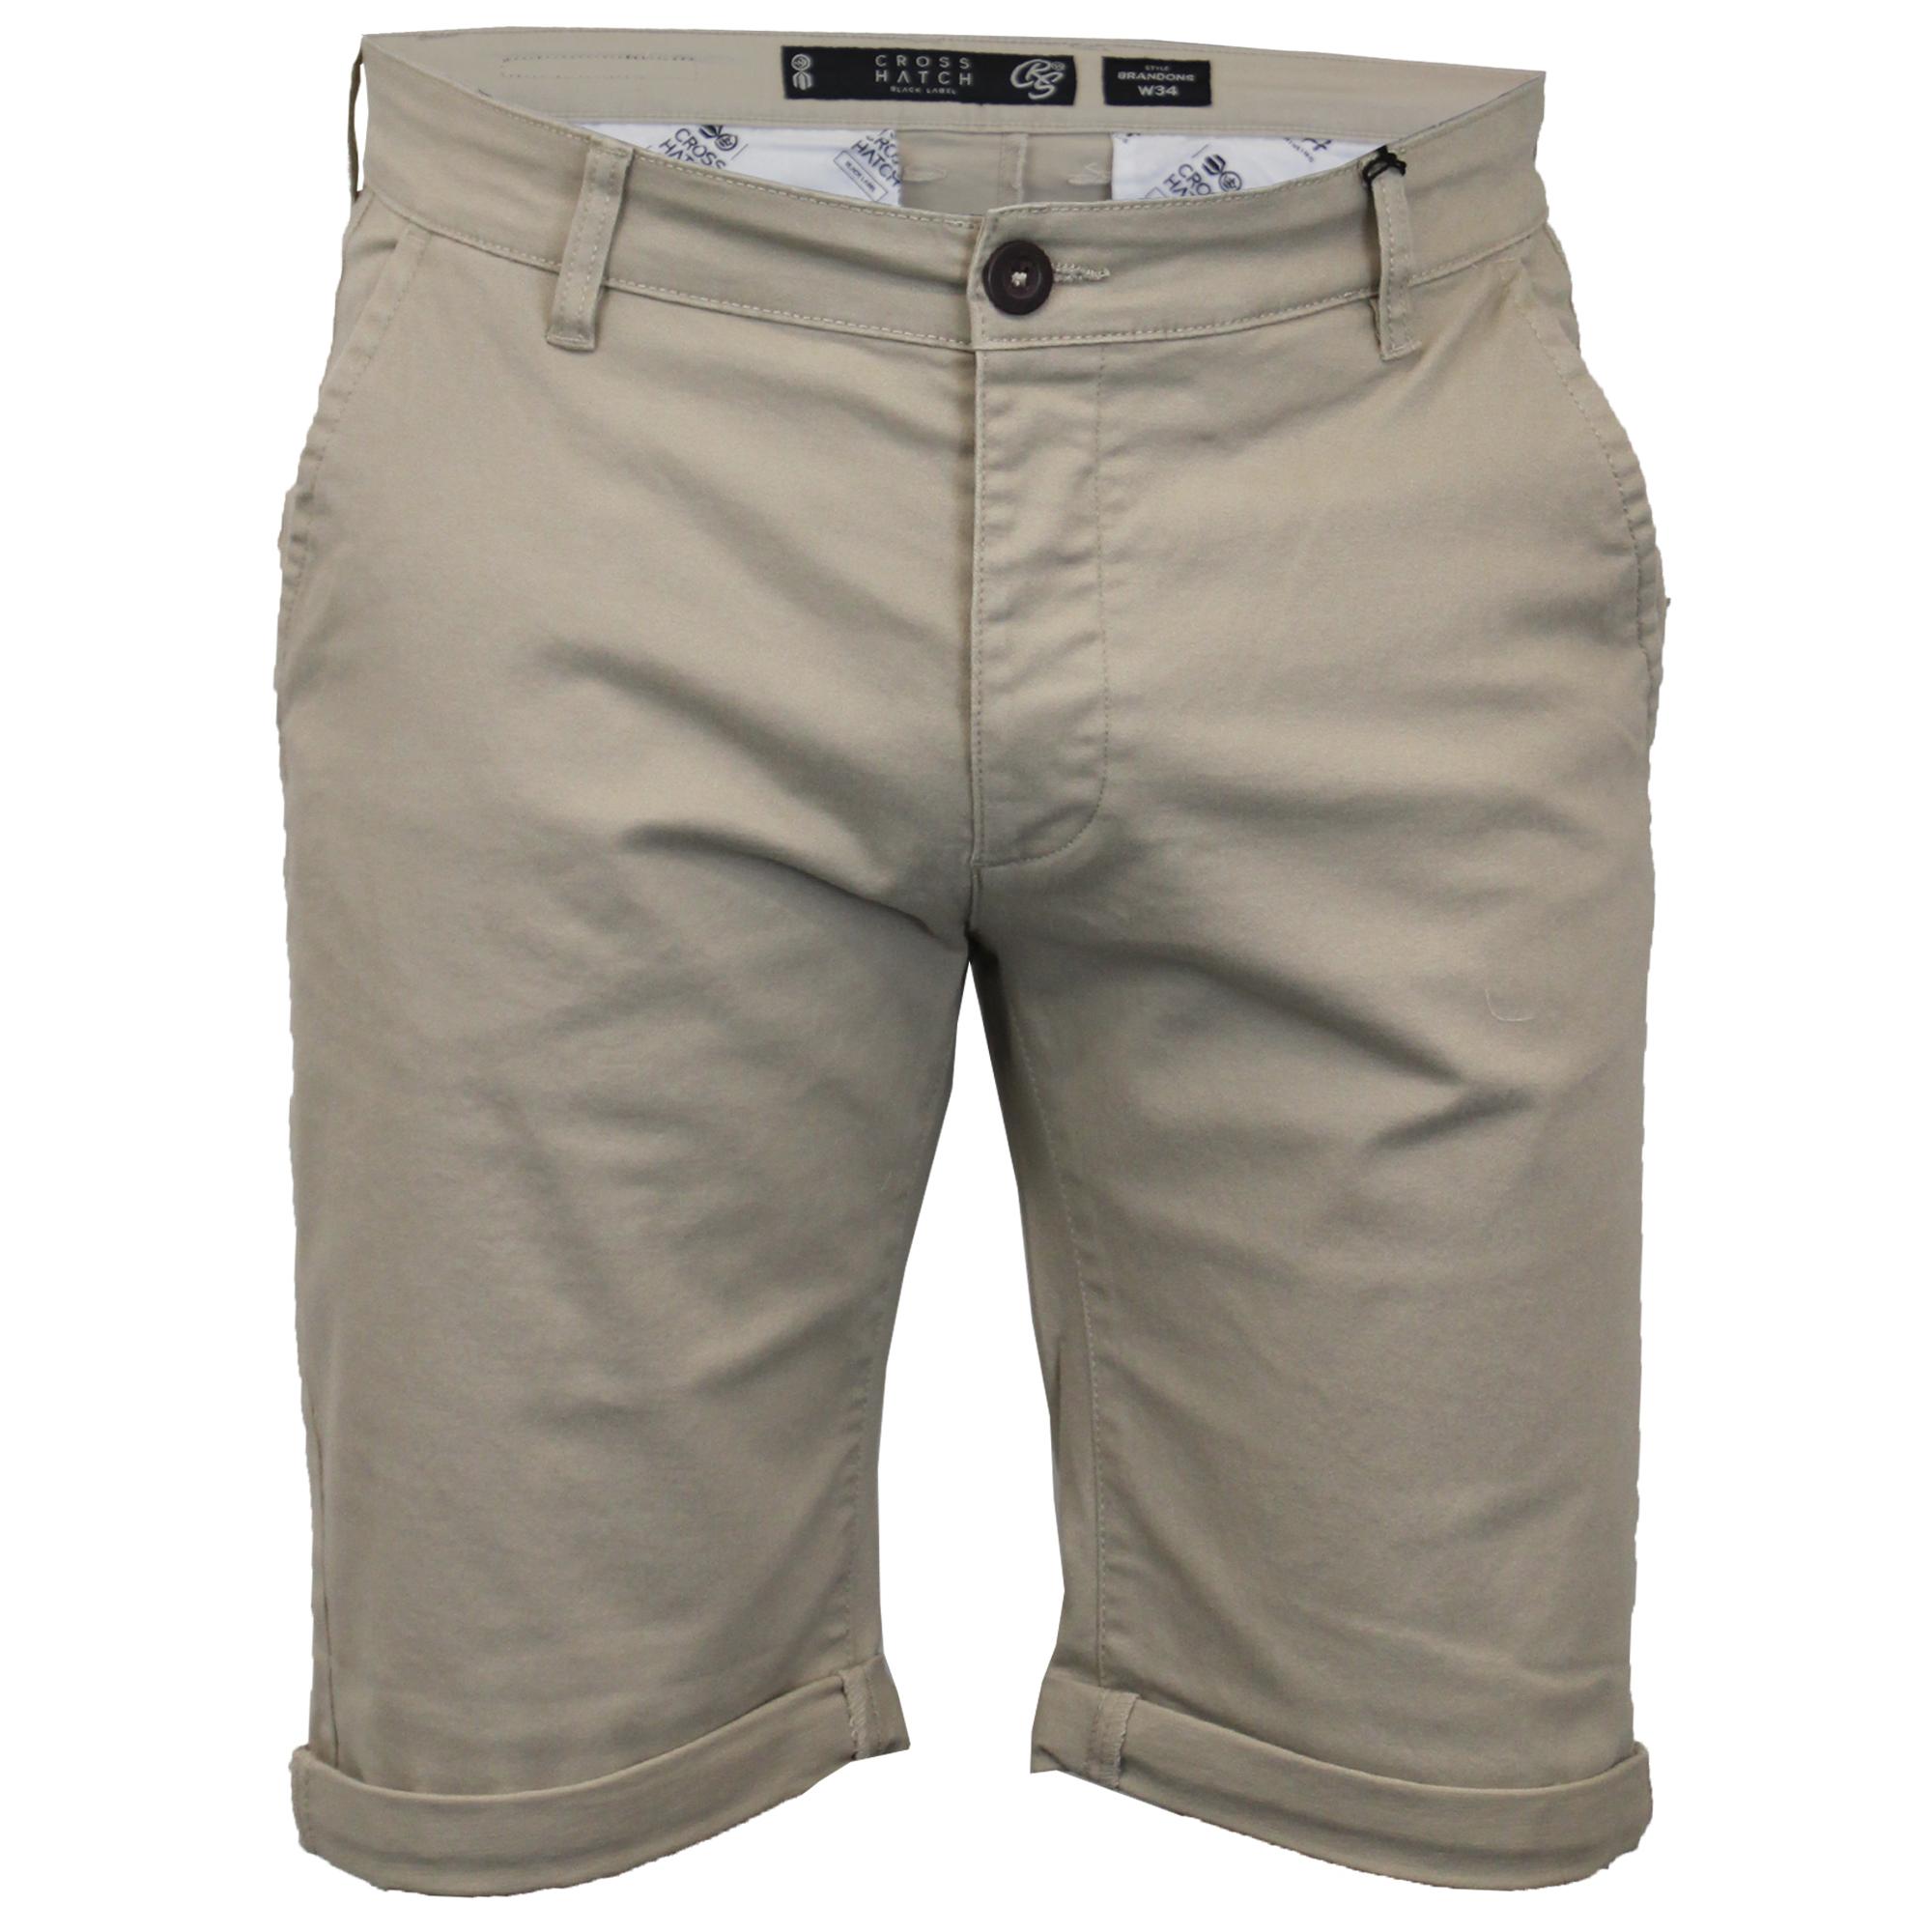 thumbnail 11 - Mens-Chino-Shorts-Crosshatch-Brandons-Knee-Length-Fastrack-Roll-Up-Summer-New